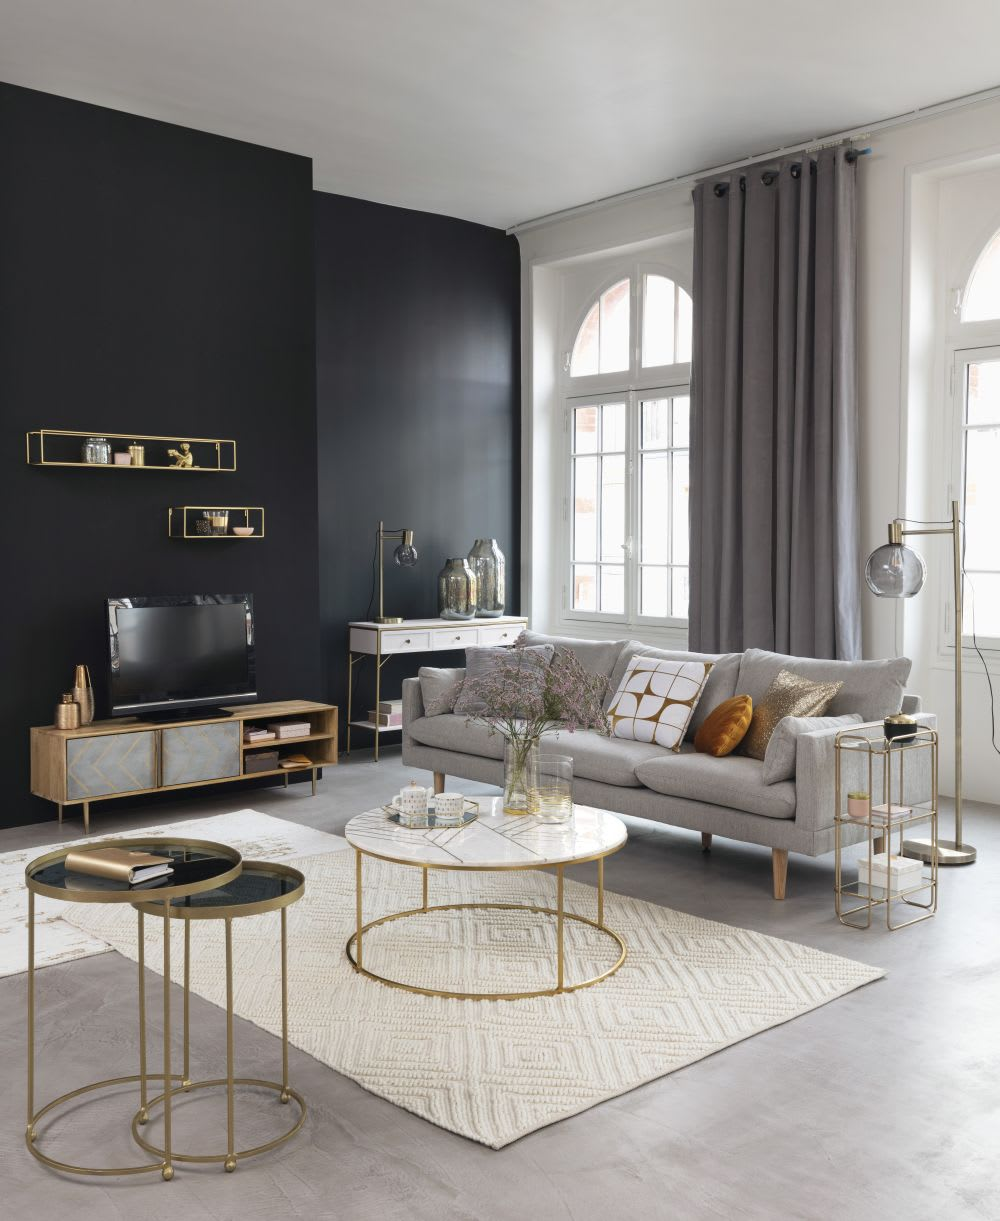 etag re en verre et m tal dor jane maisons du monde. Black Bedroom Furniture Sets. Home Design Ideas